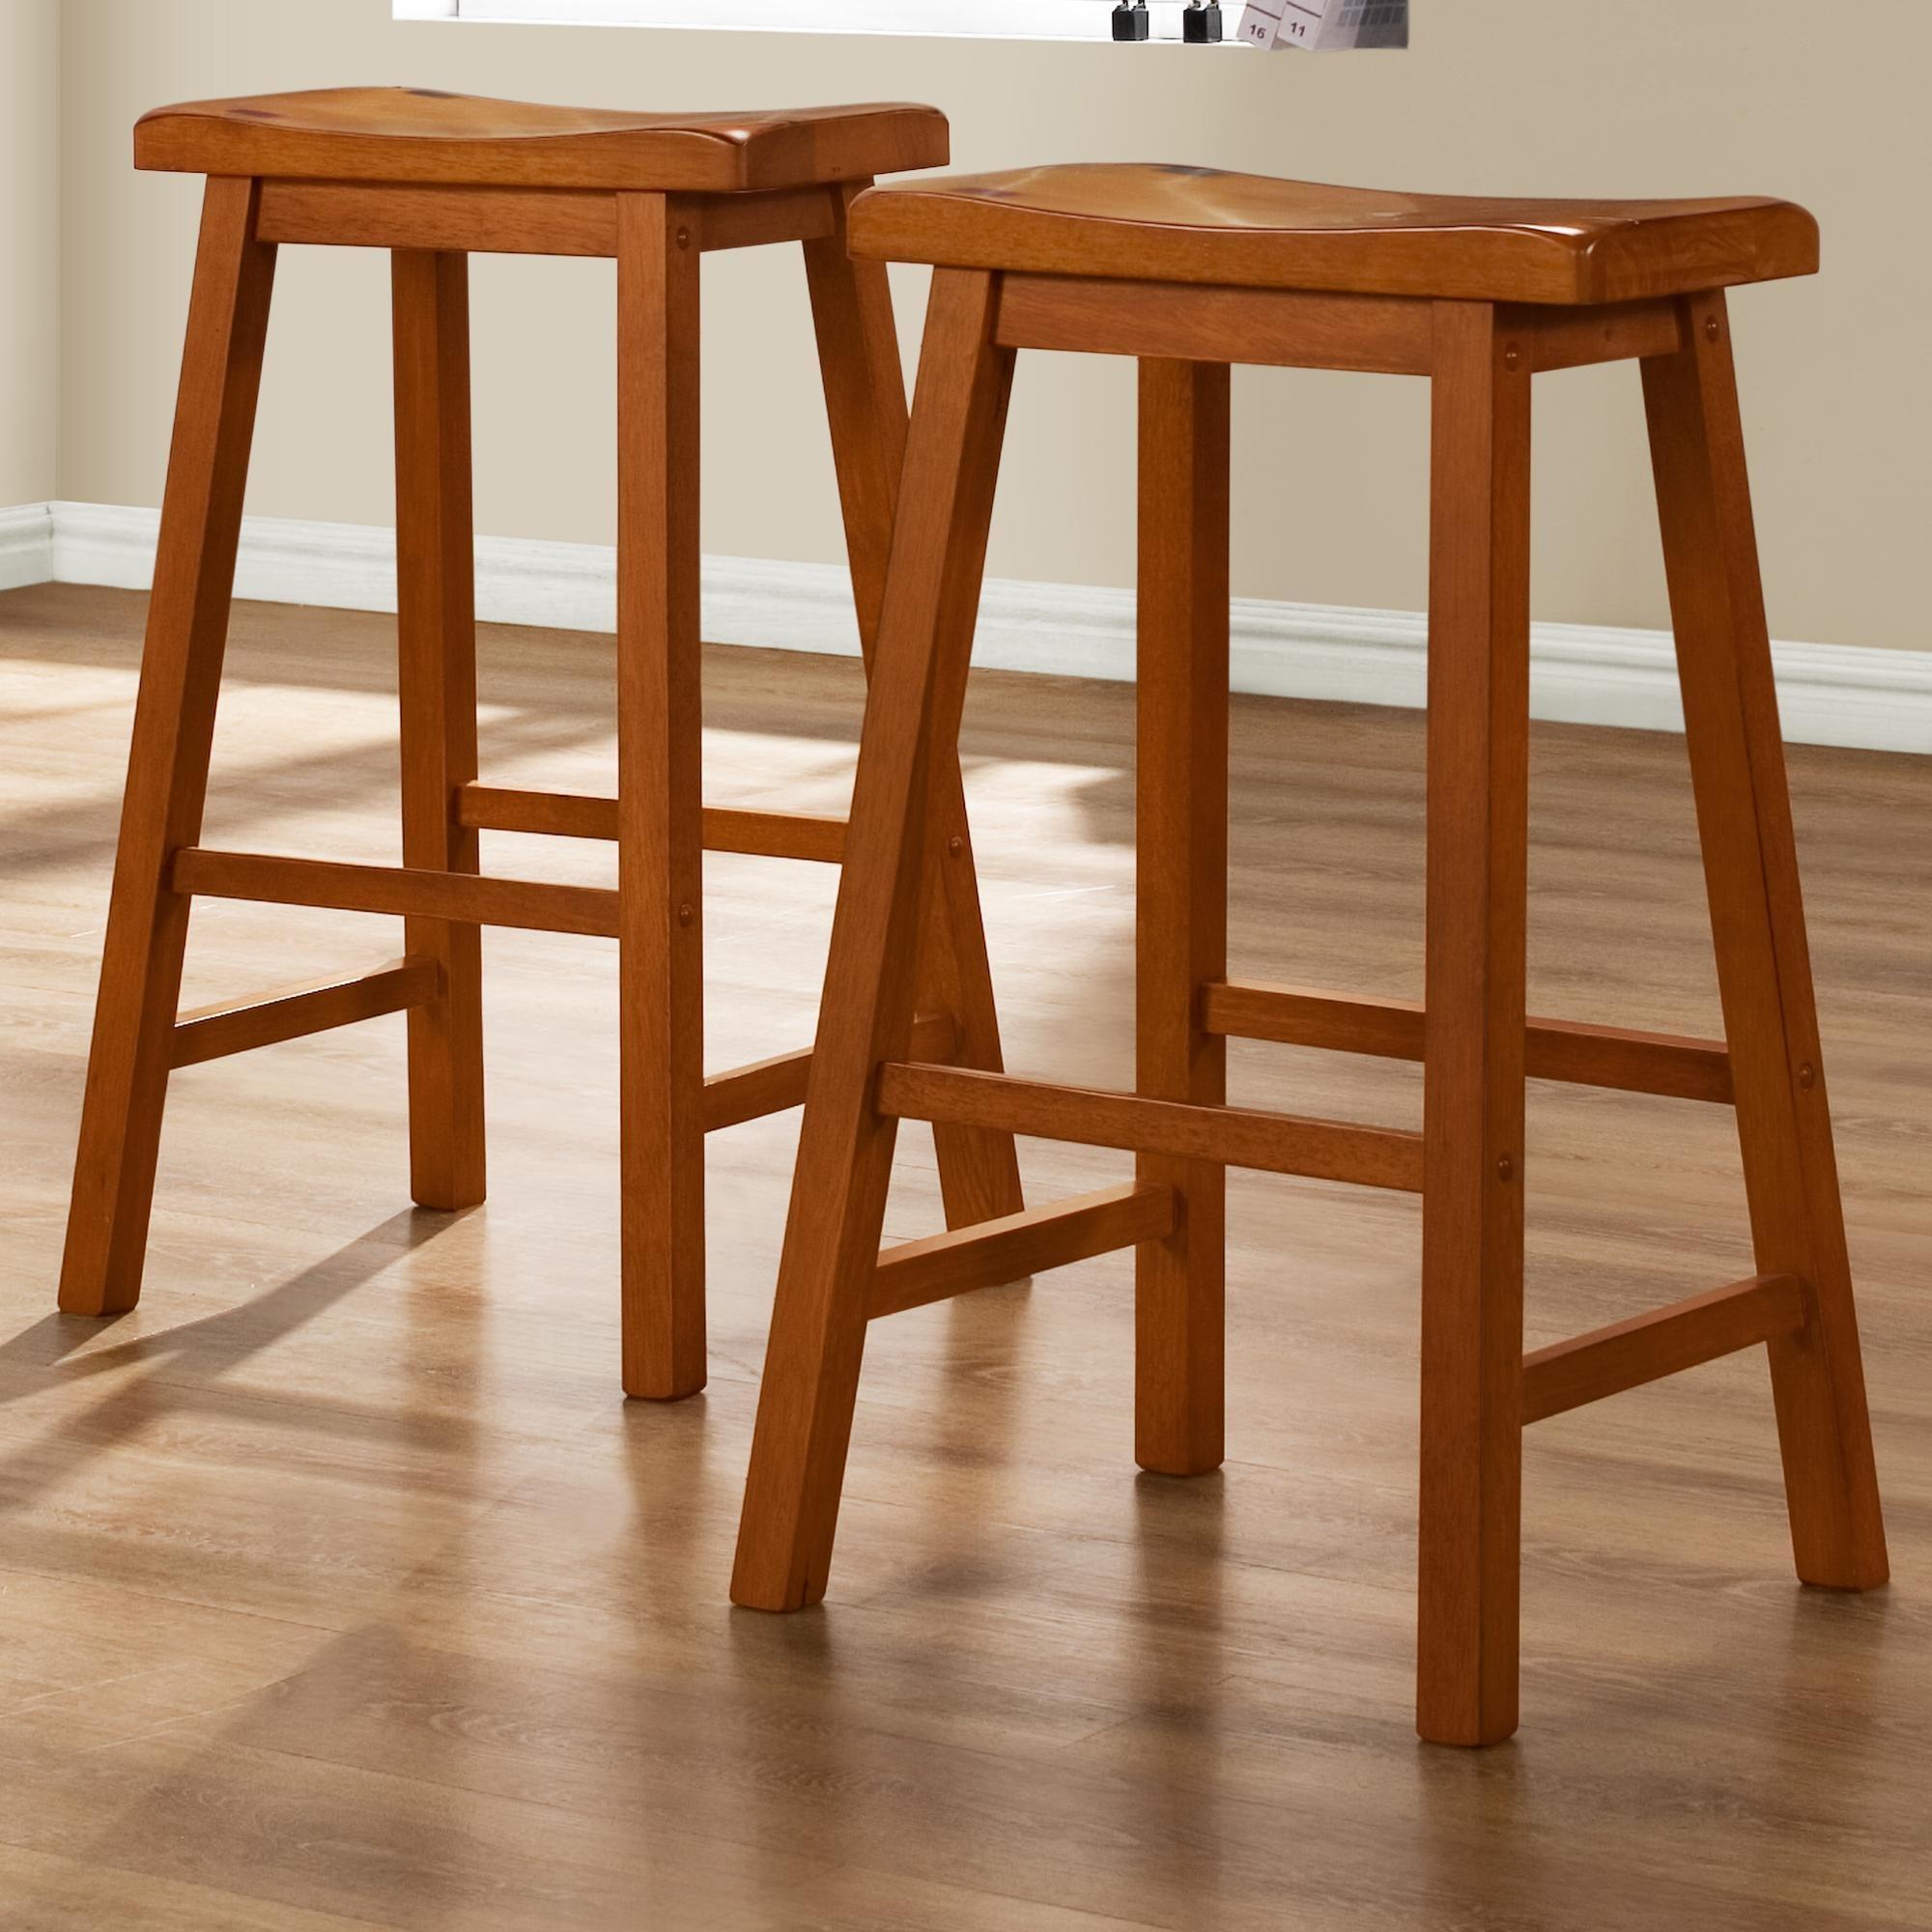 Saddle Seat Counter Bar Stools Oak 29 Inch Kitchen Island Set Of 2